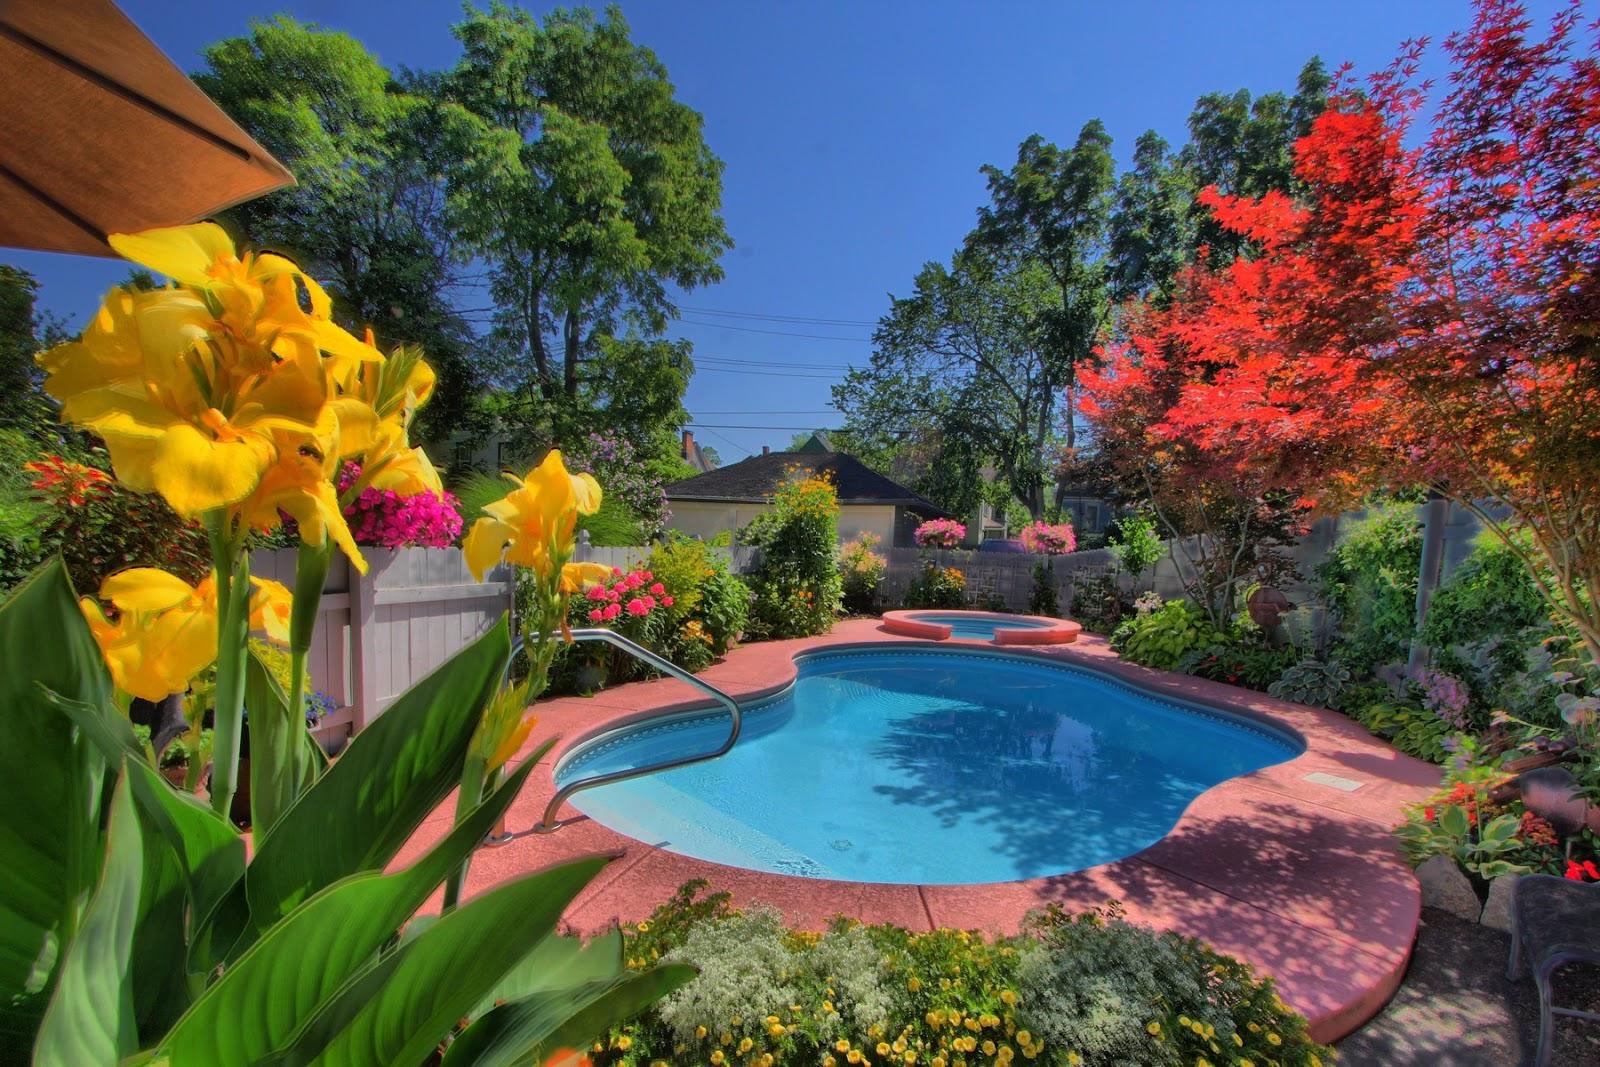 Garden walk buffalo put it on your bucket list for Richmond gardens pool